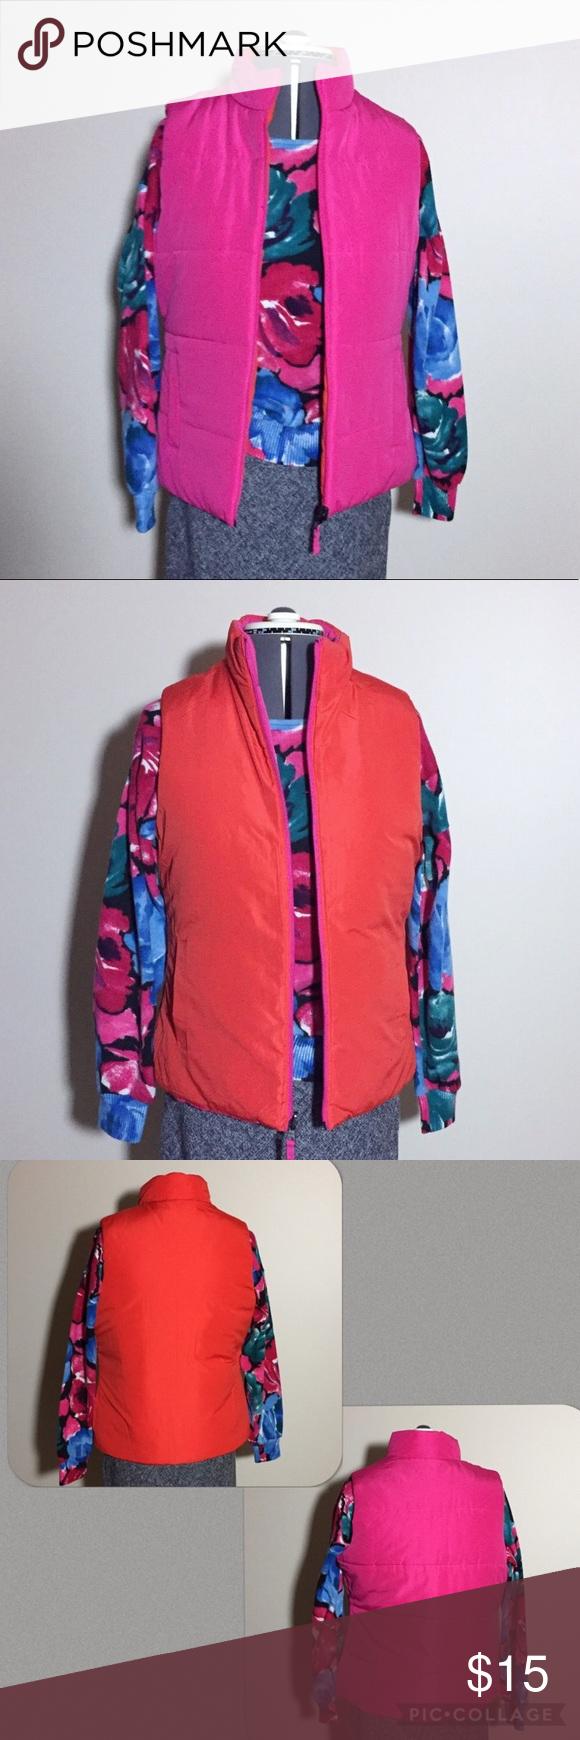 Merona Pink & Orange Reversible Puffer Vest Merona Orange